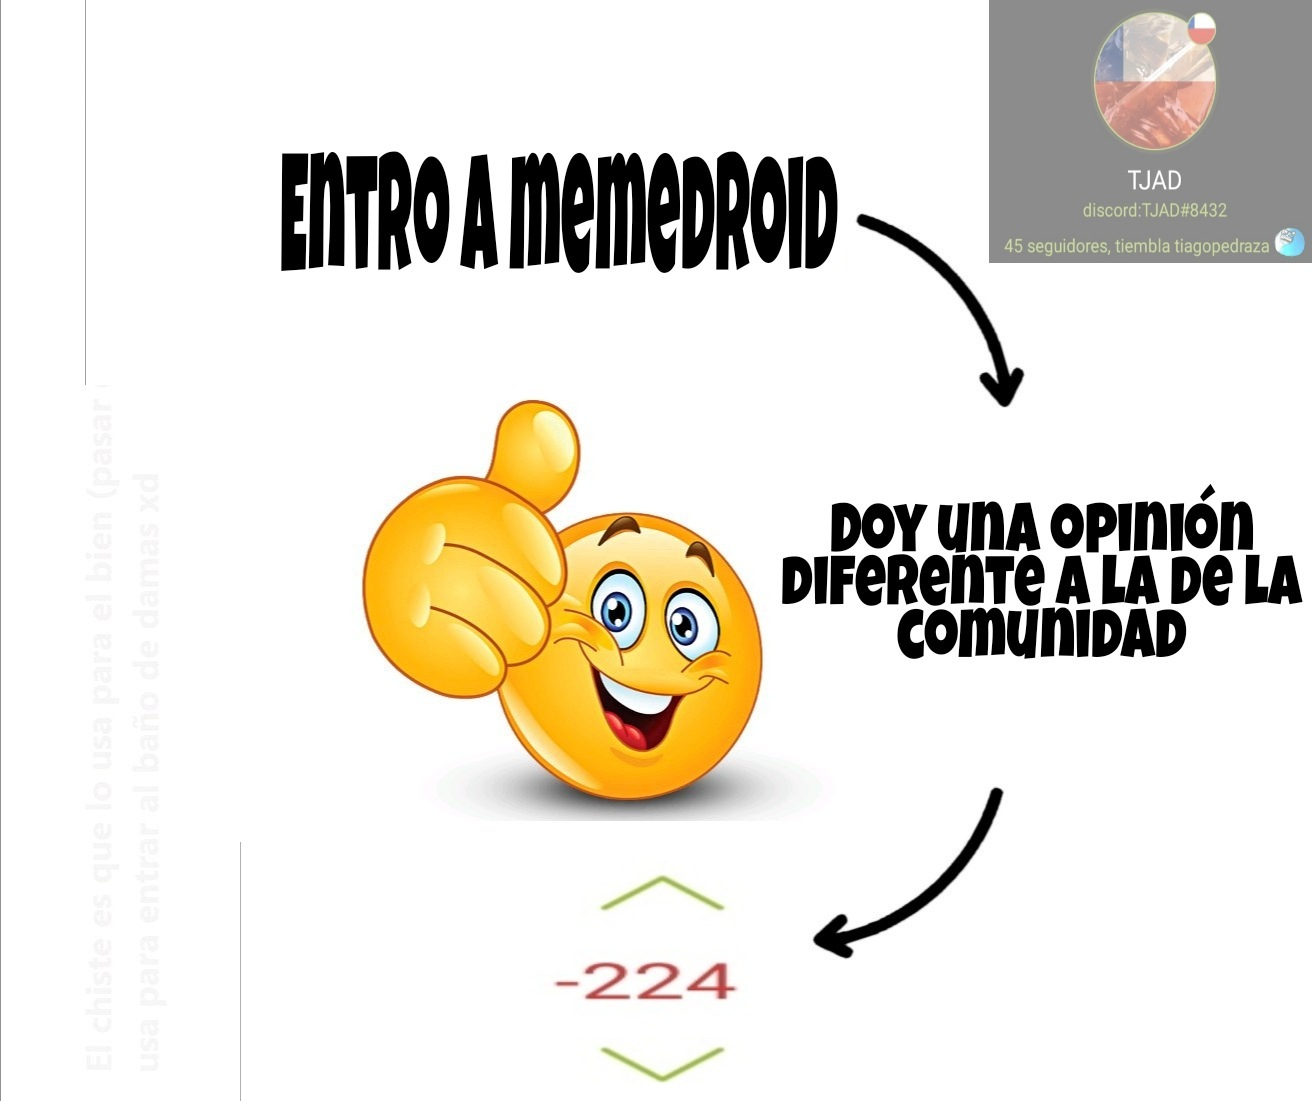 Kien m aze una mar ka de ajua? :foreveralone: - meme